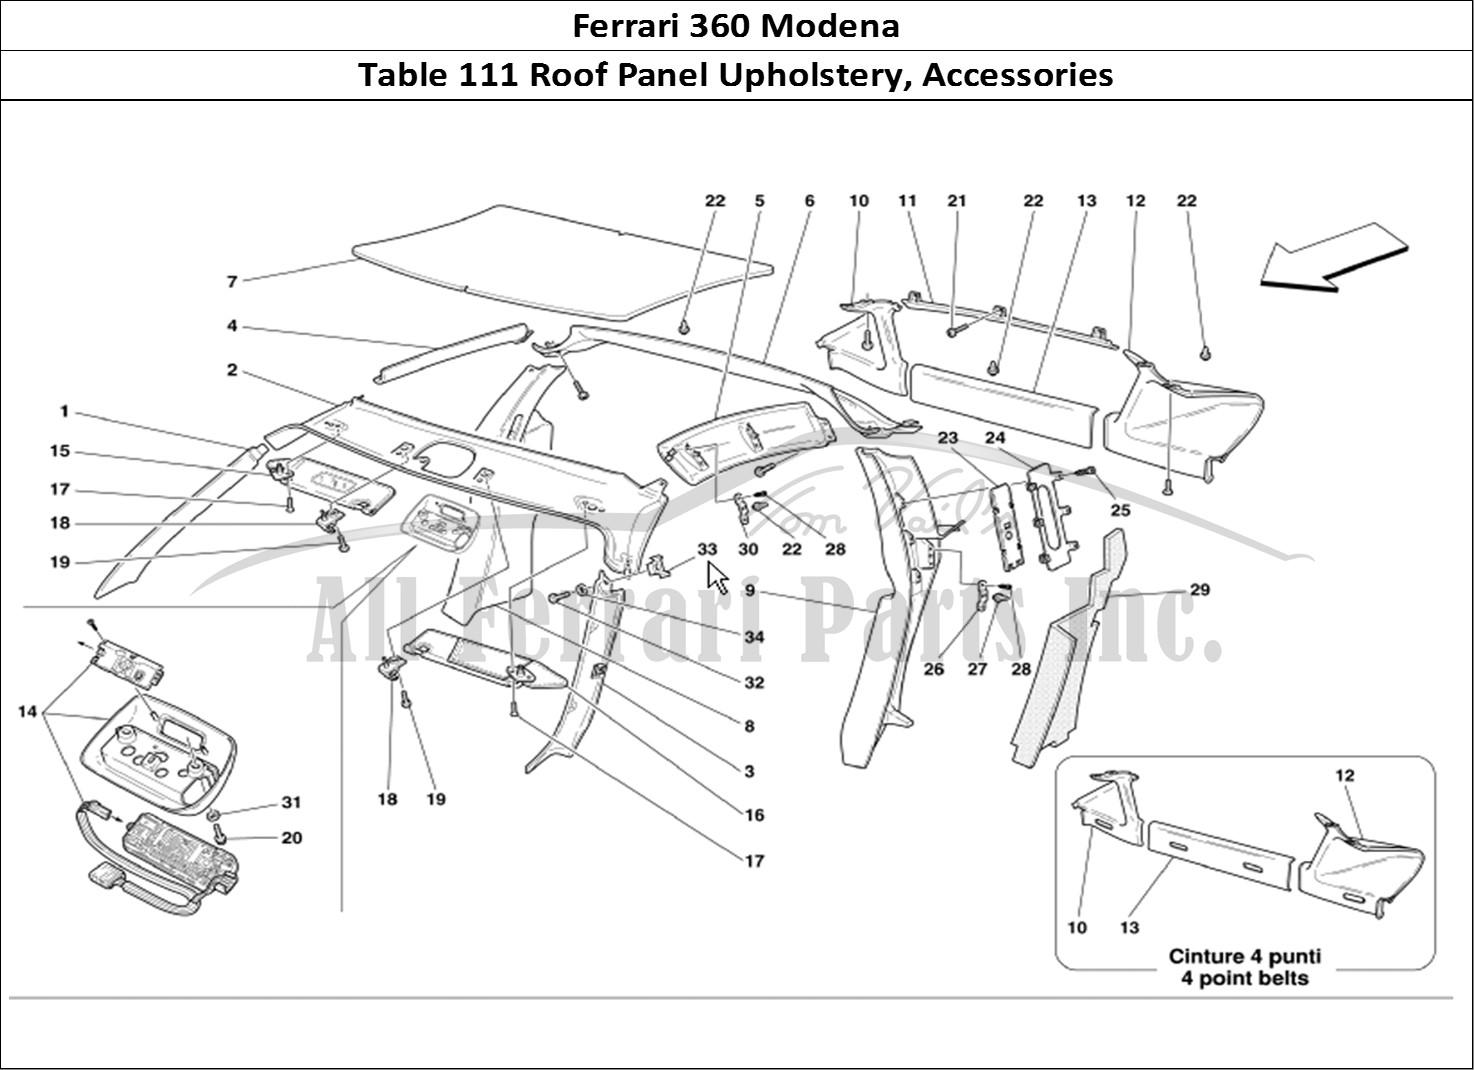 Buy original Ferrari 360 Modena 111 Roof Panel Upholstery